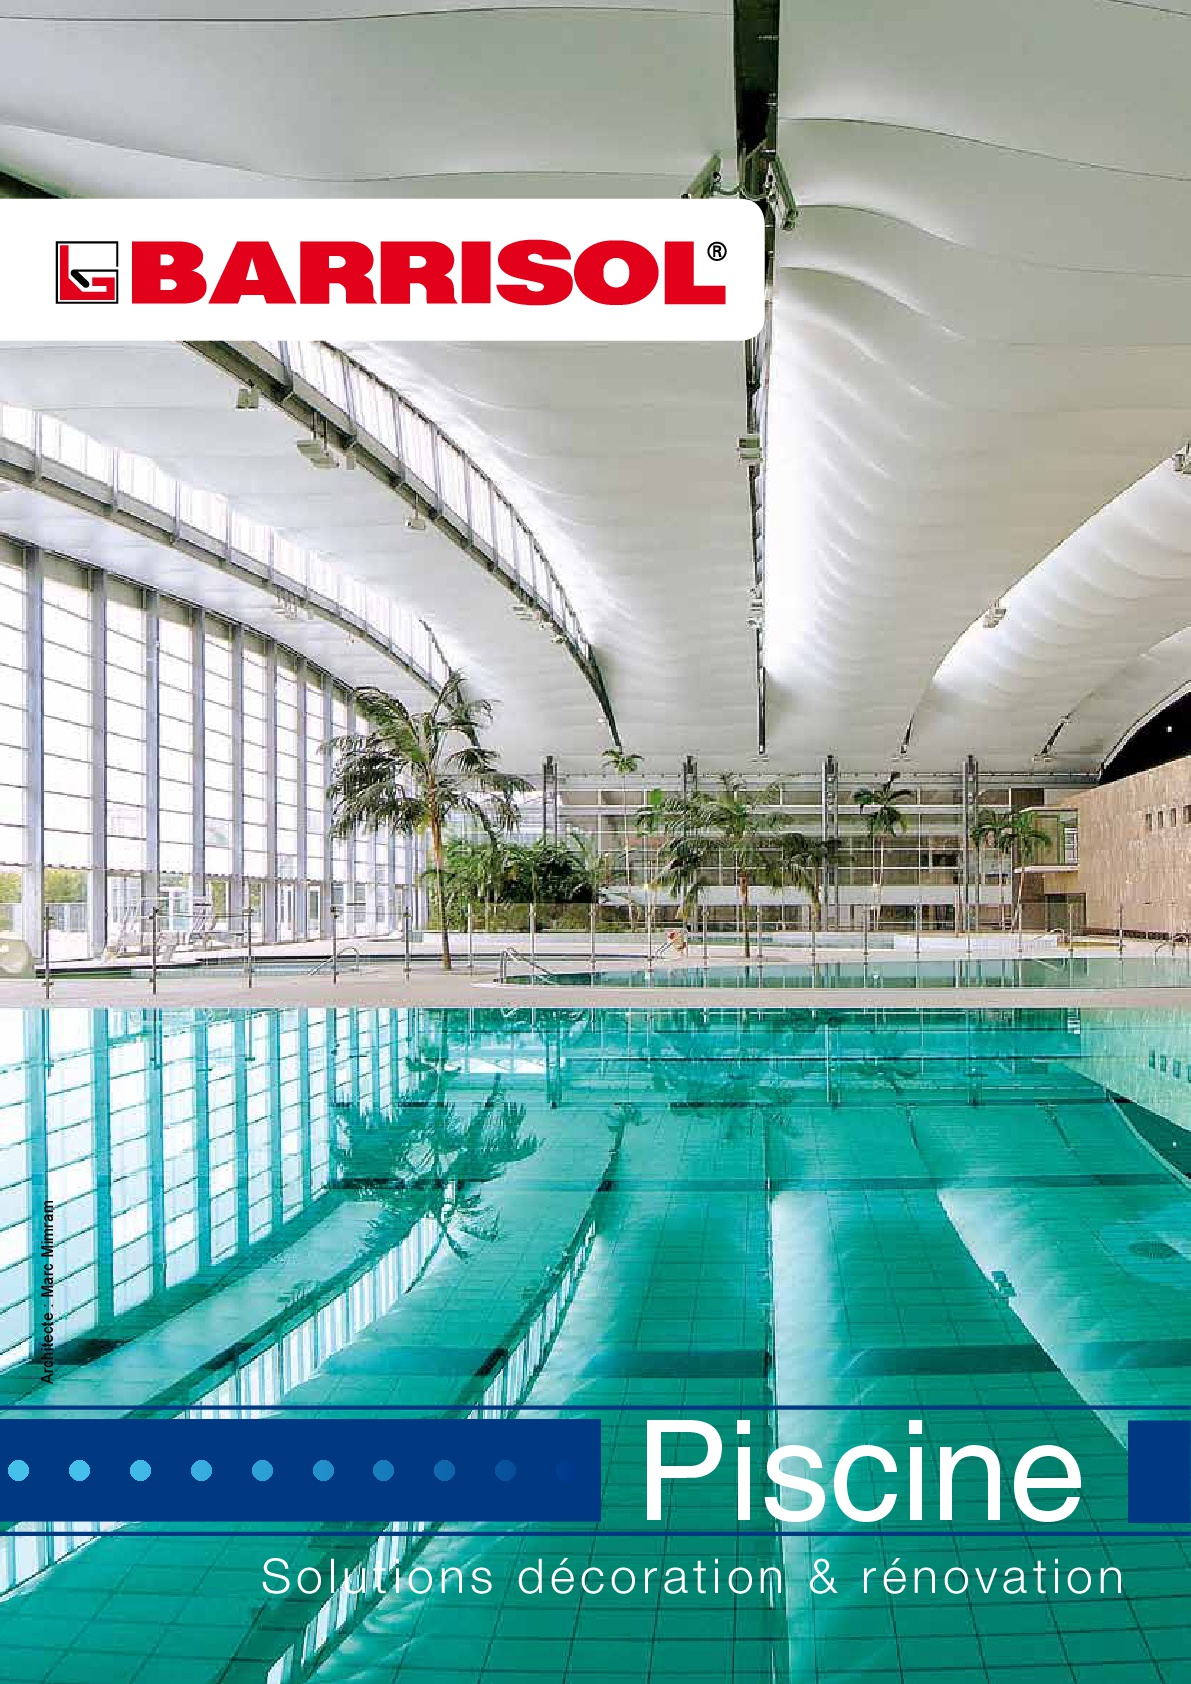 BARRISOL Piscine